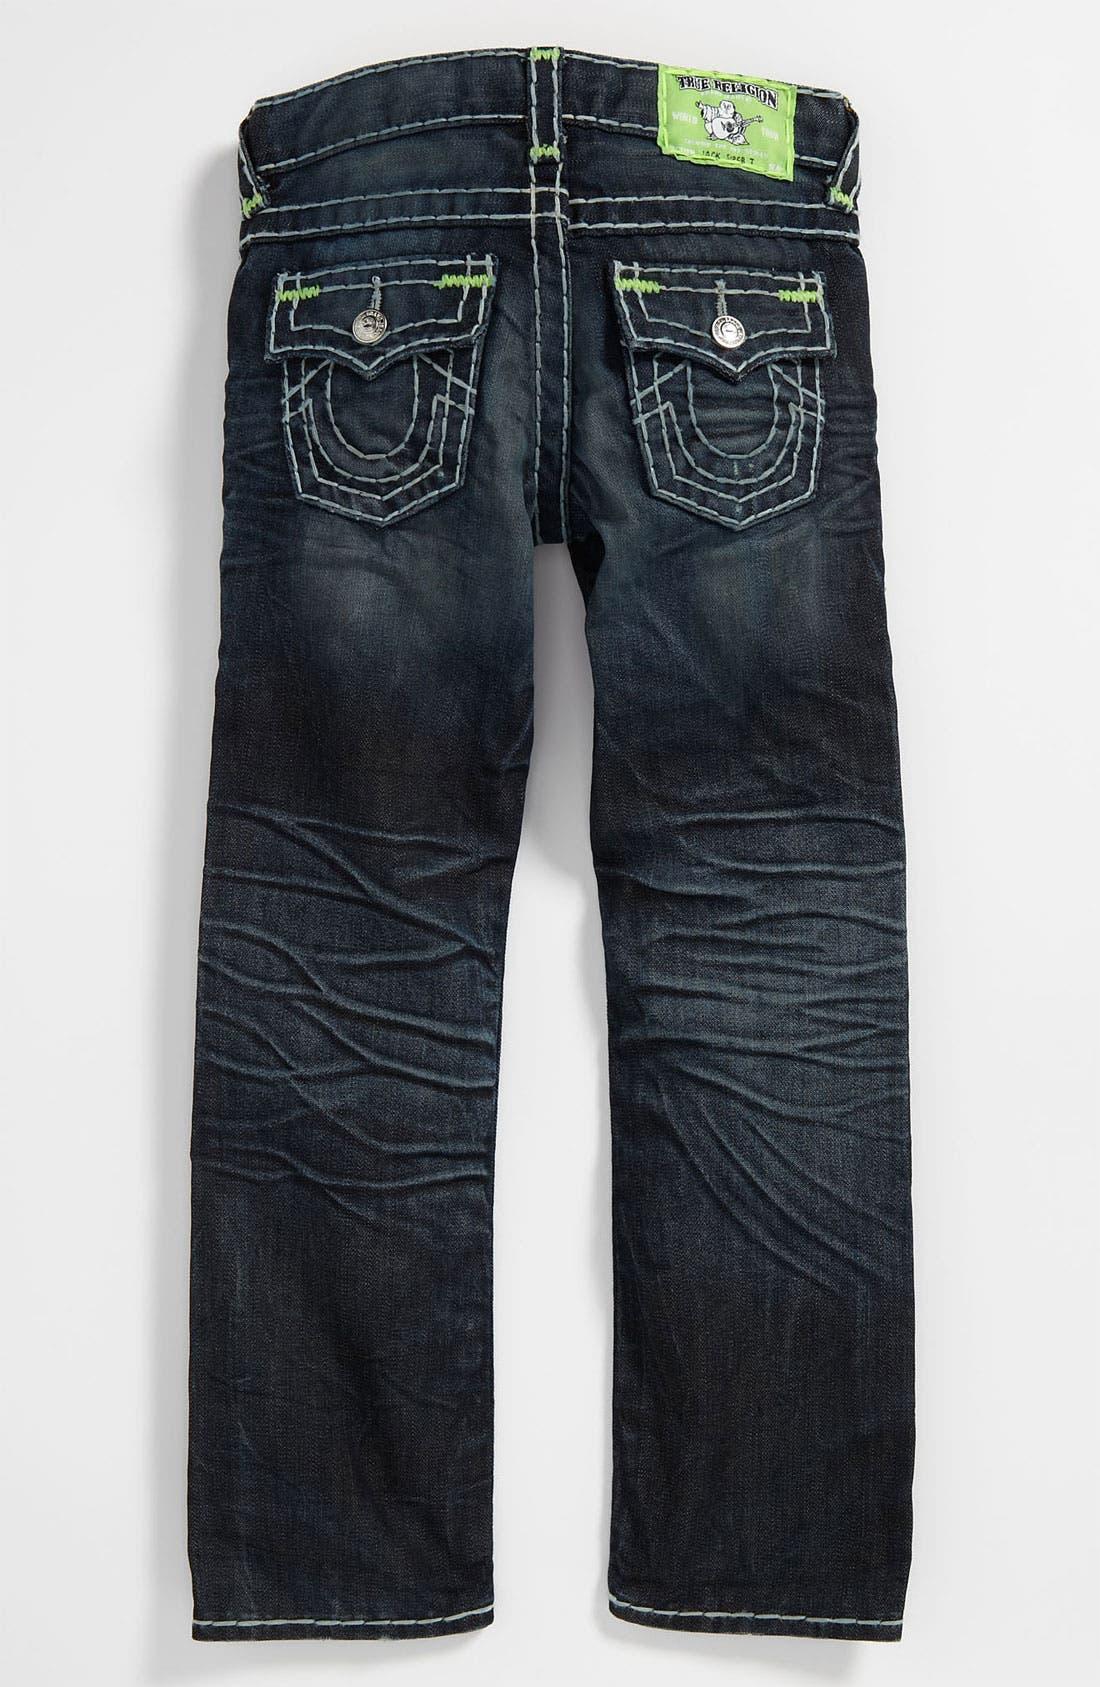 Alternate Image 1 Selected - True Religion Brand Jeans 'Jack Super T' Jeans (Big Boys)